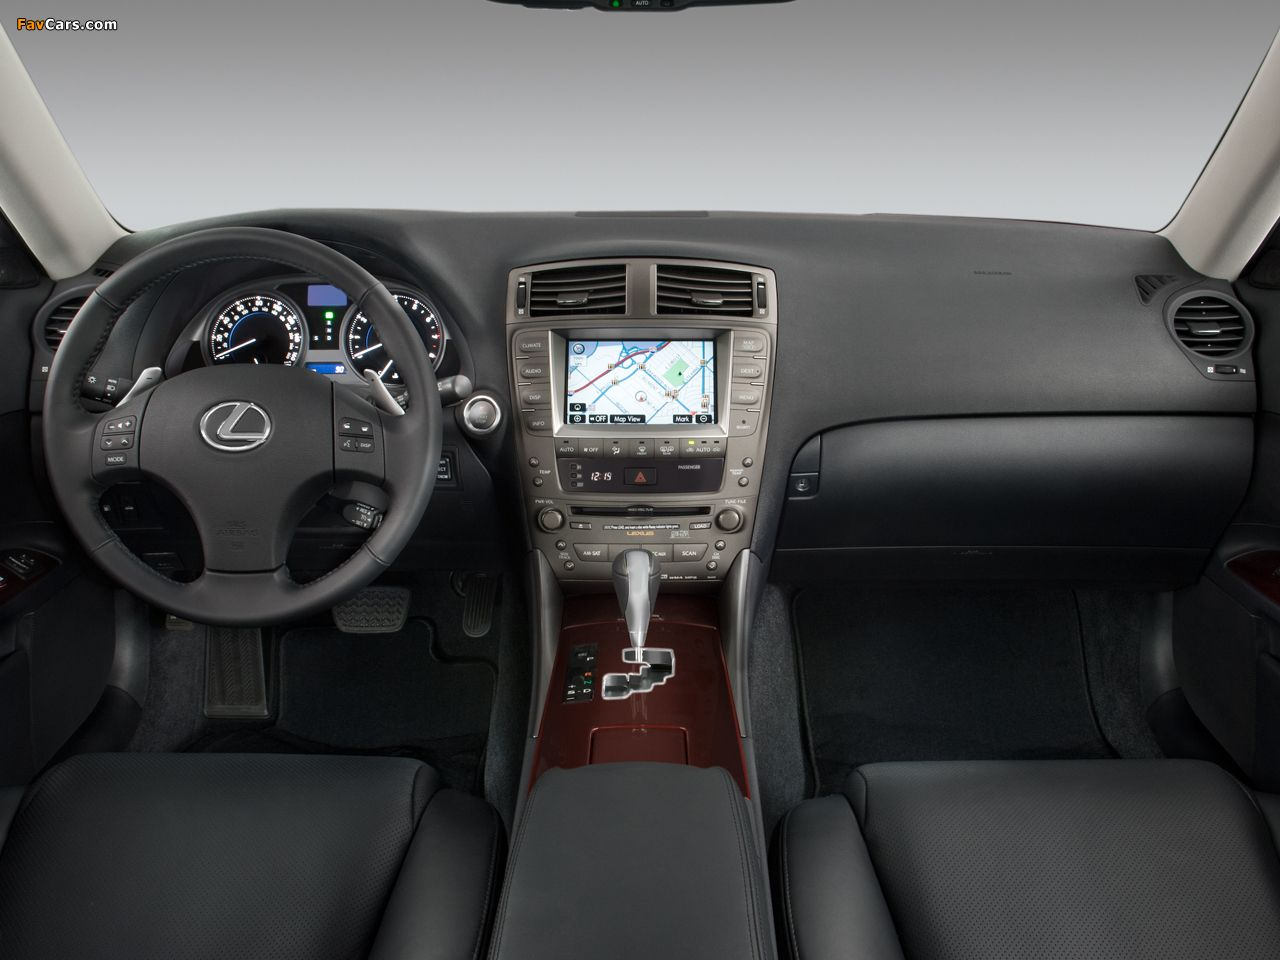 Lexus IS 350 (XE20) 200508